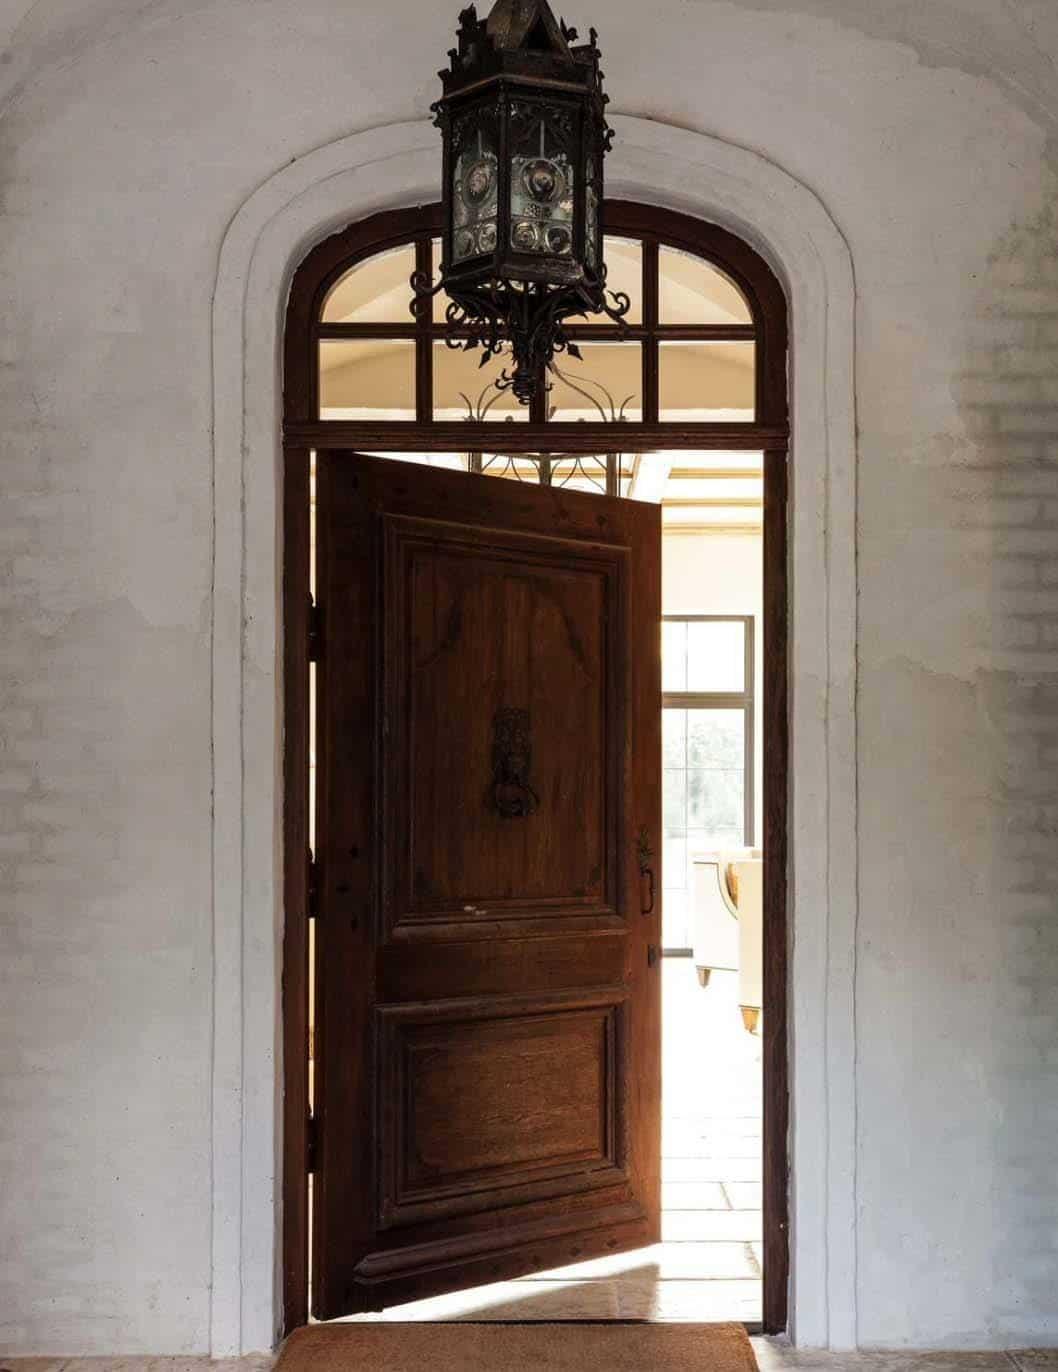 Mediterranean Style Residence-Stocker Hoesterey Montenegro-19-1 Kindesign